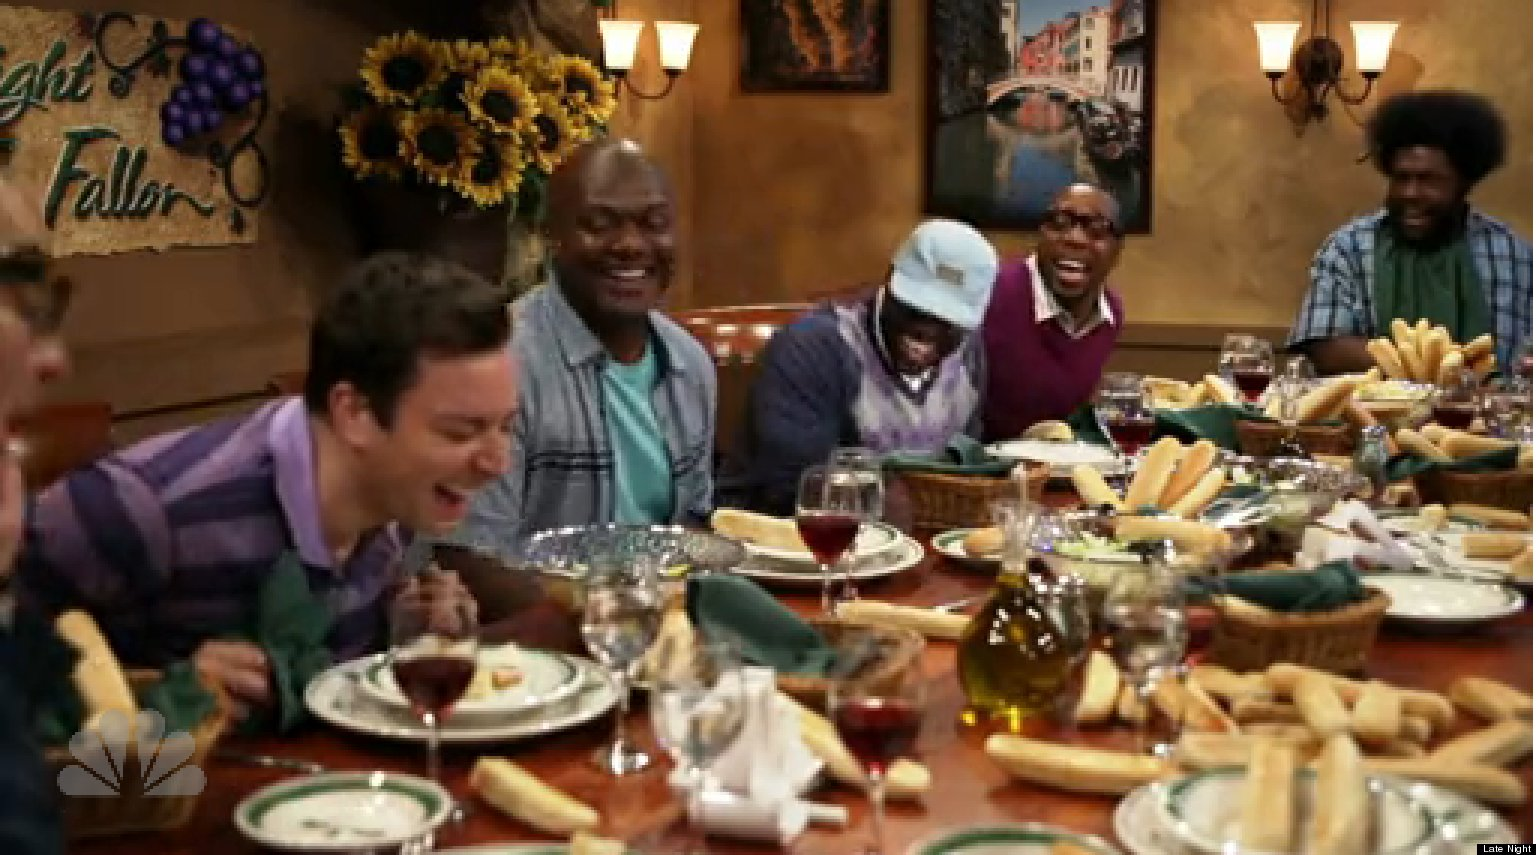 Jimmy Fallon Olive Garden Parody Is Spot-On (VIDEO) | HuffPost